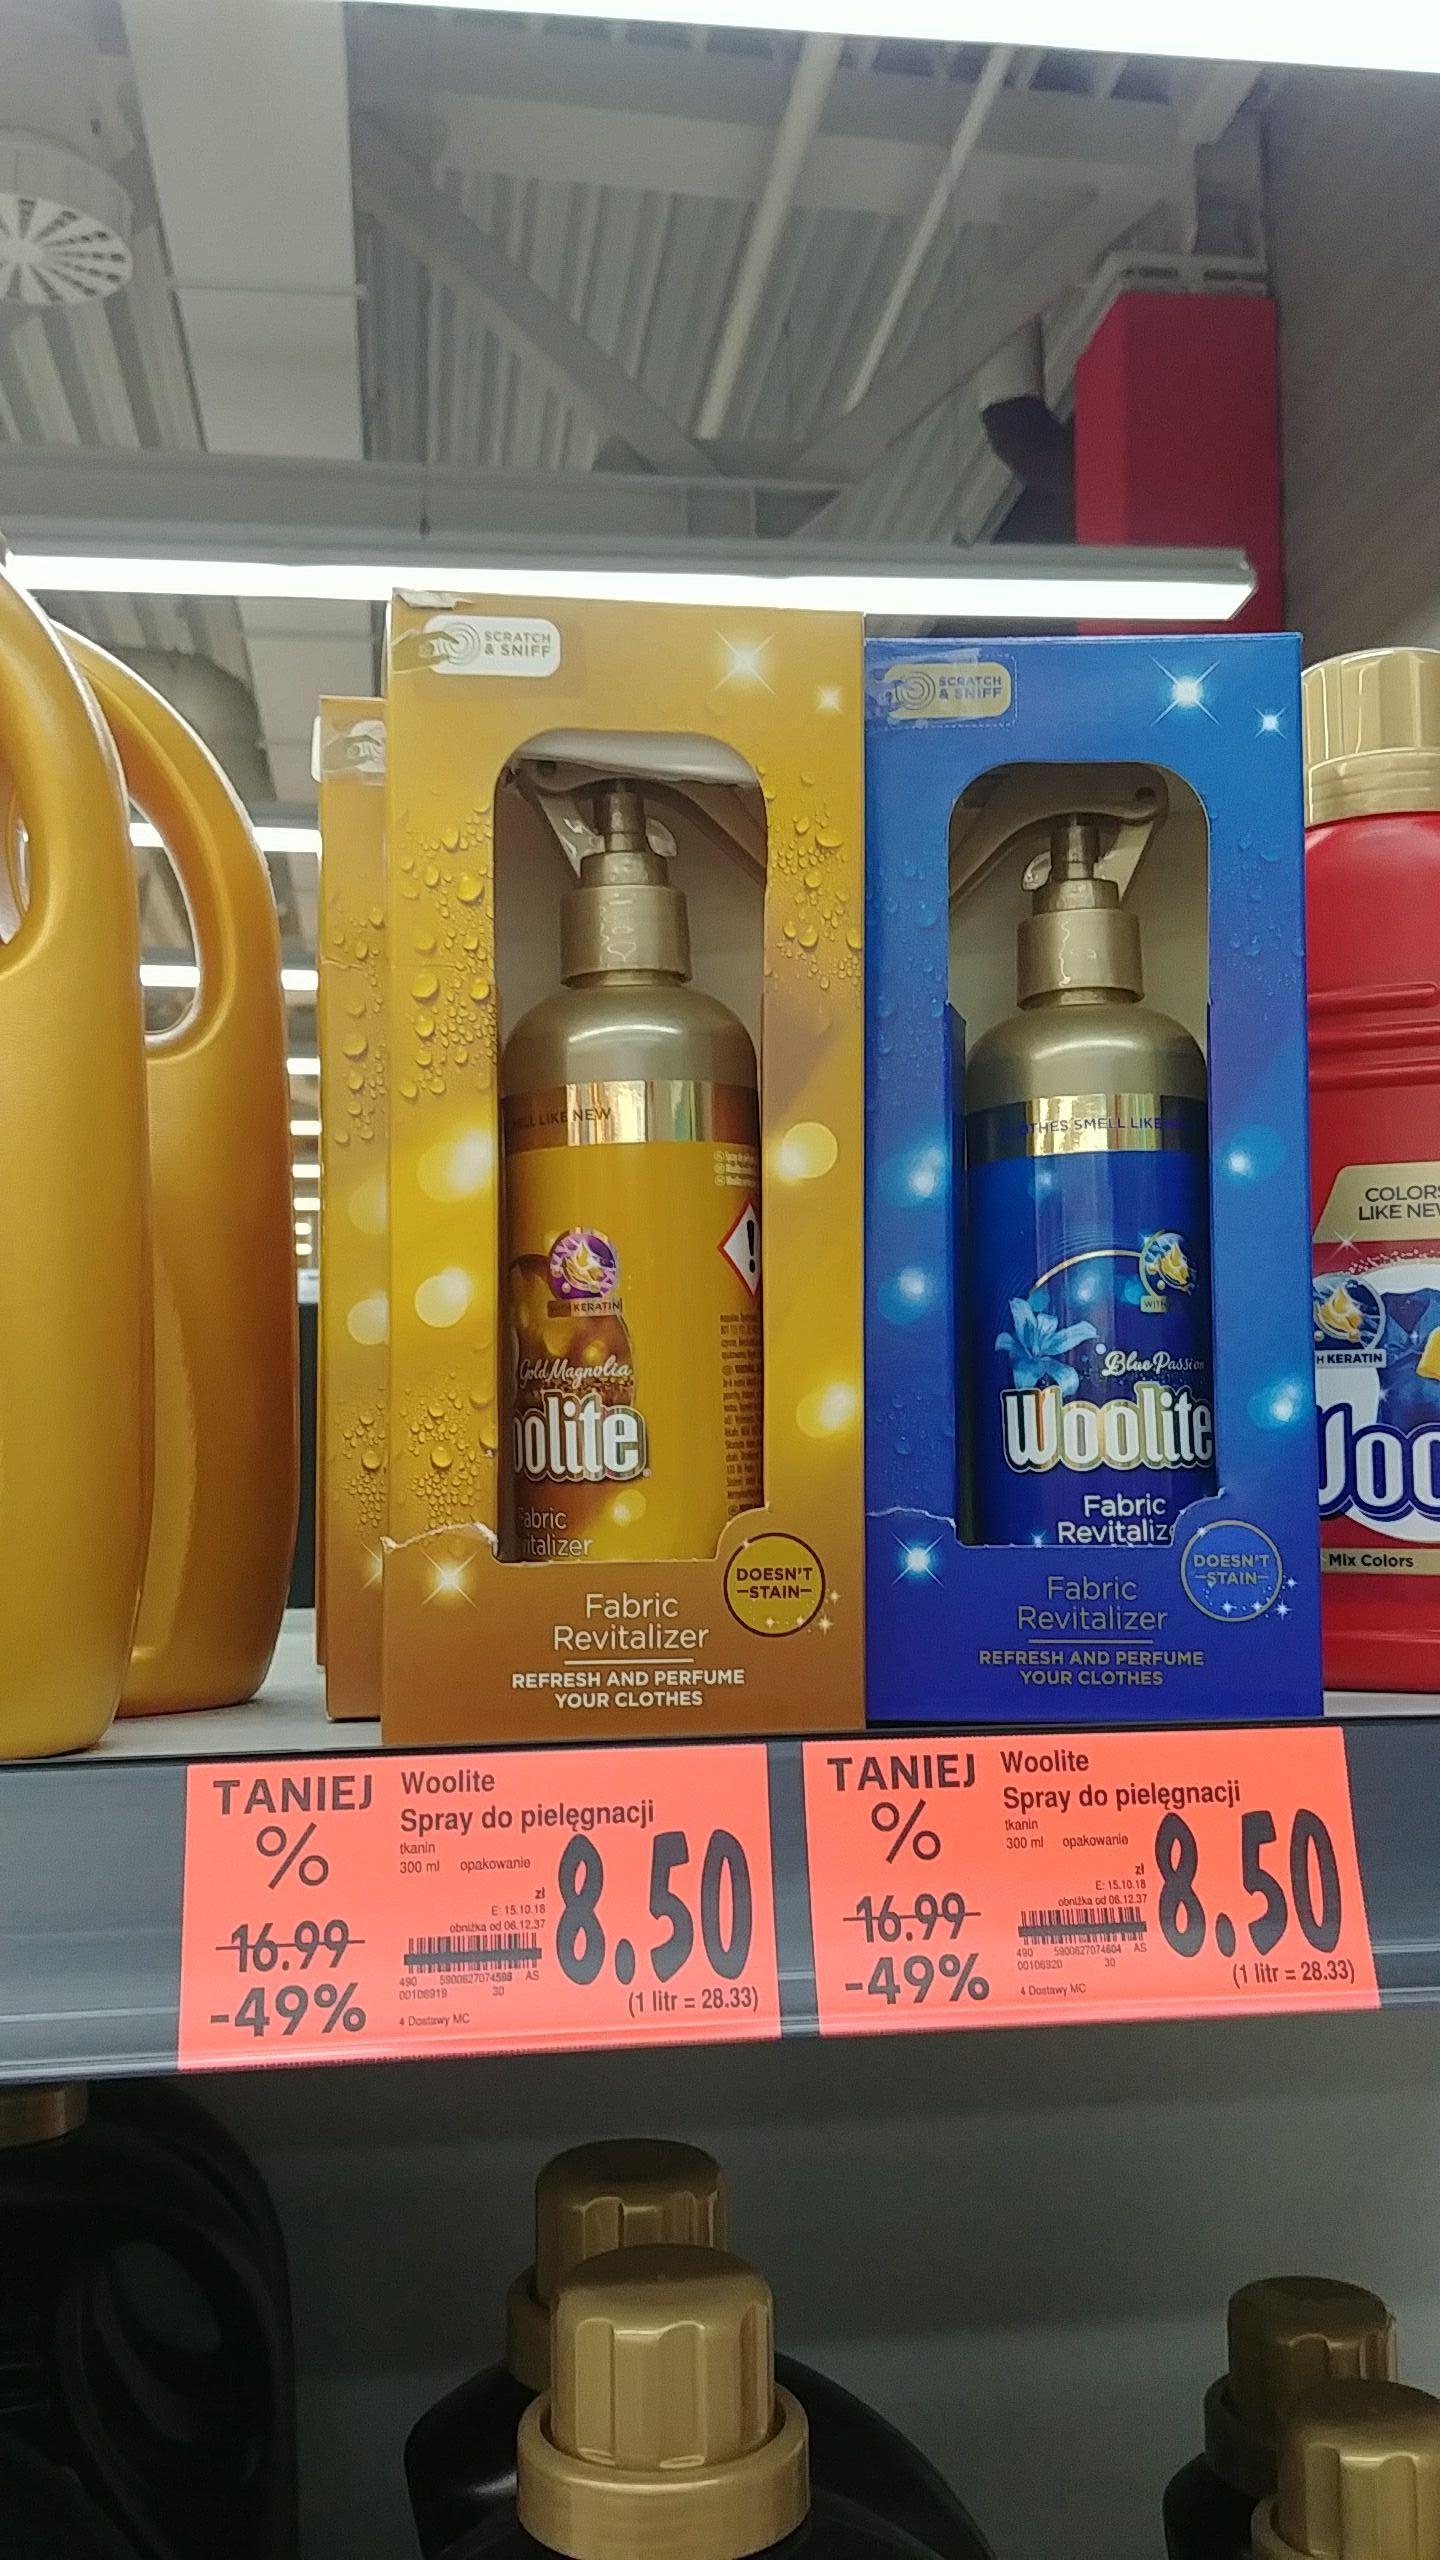 Woolite spray do tkanin @ Kaufland